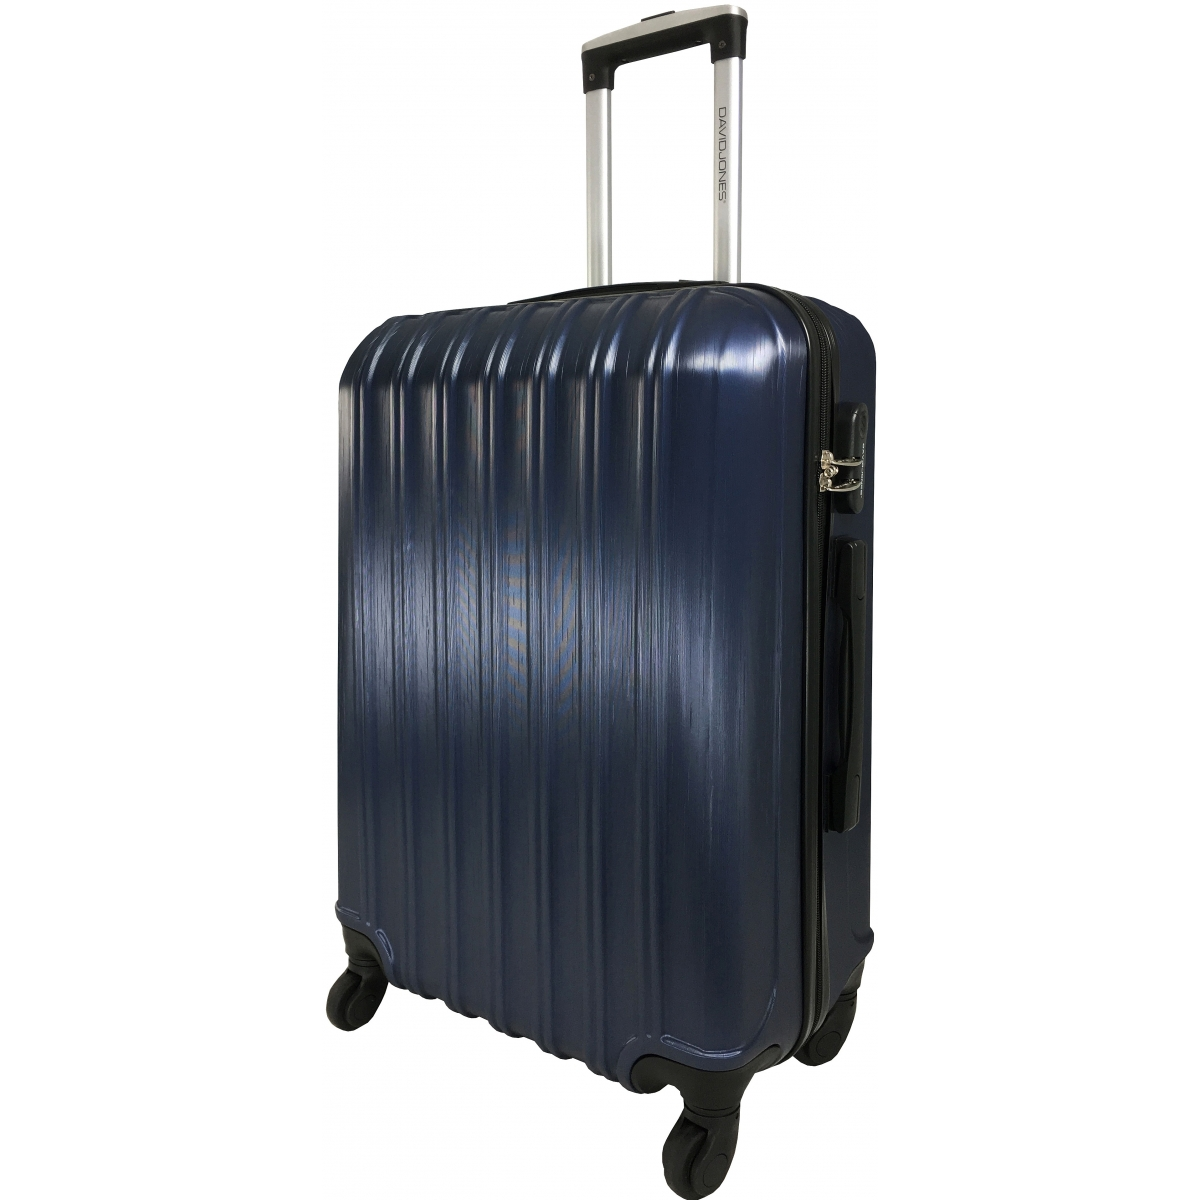 lot 3 valises dont 1 valise cabine david jones marine ba10293 couleur principale marine. Black Bedroom Furniture Sets. Home Design Ideas